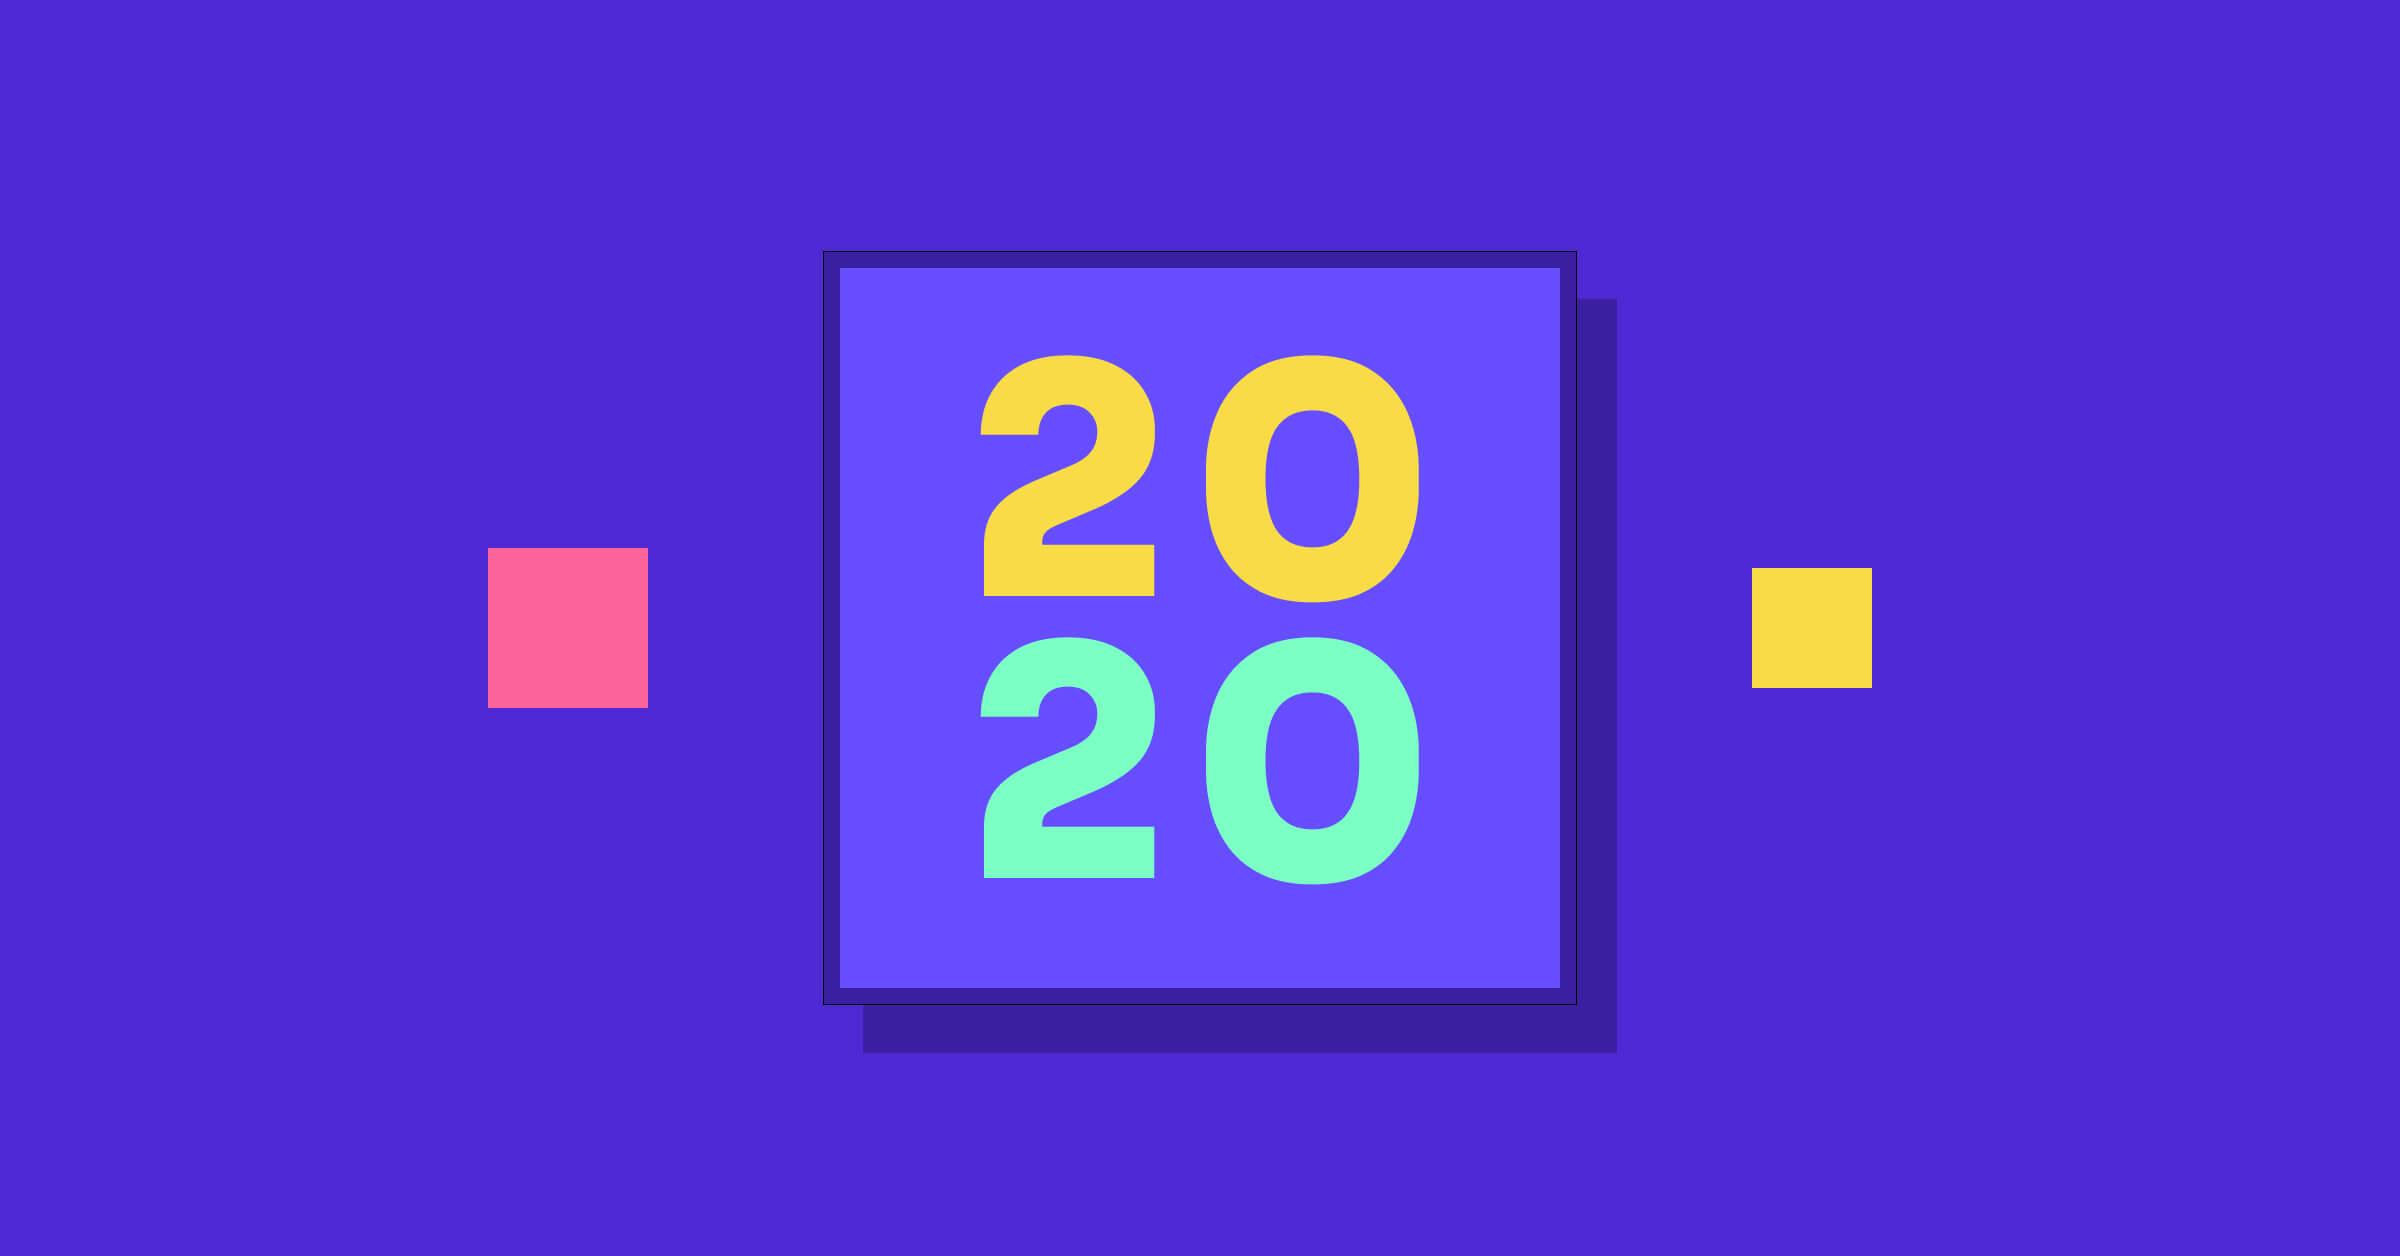 10 Hottest Design Trends in 2020